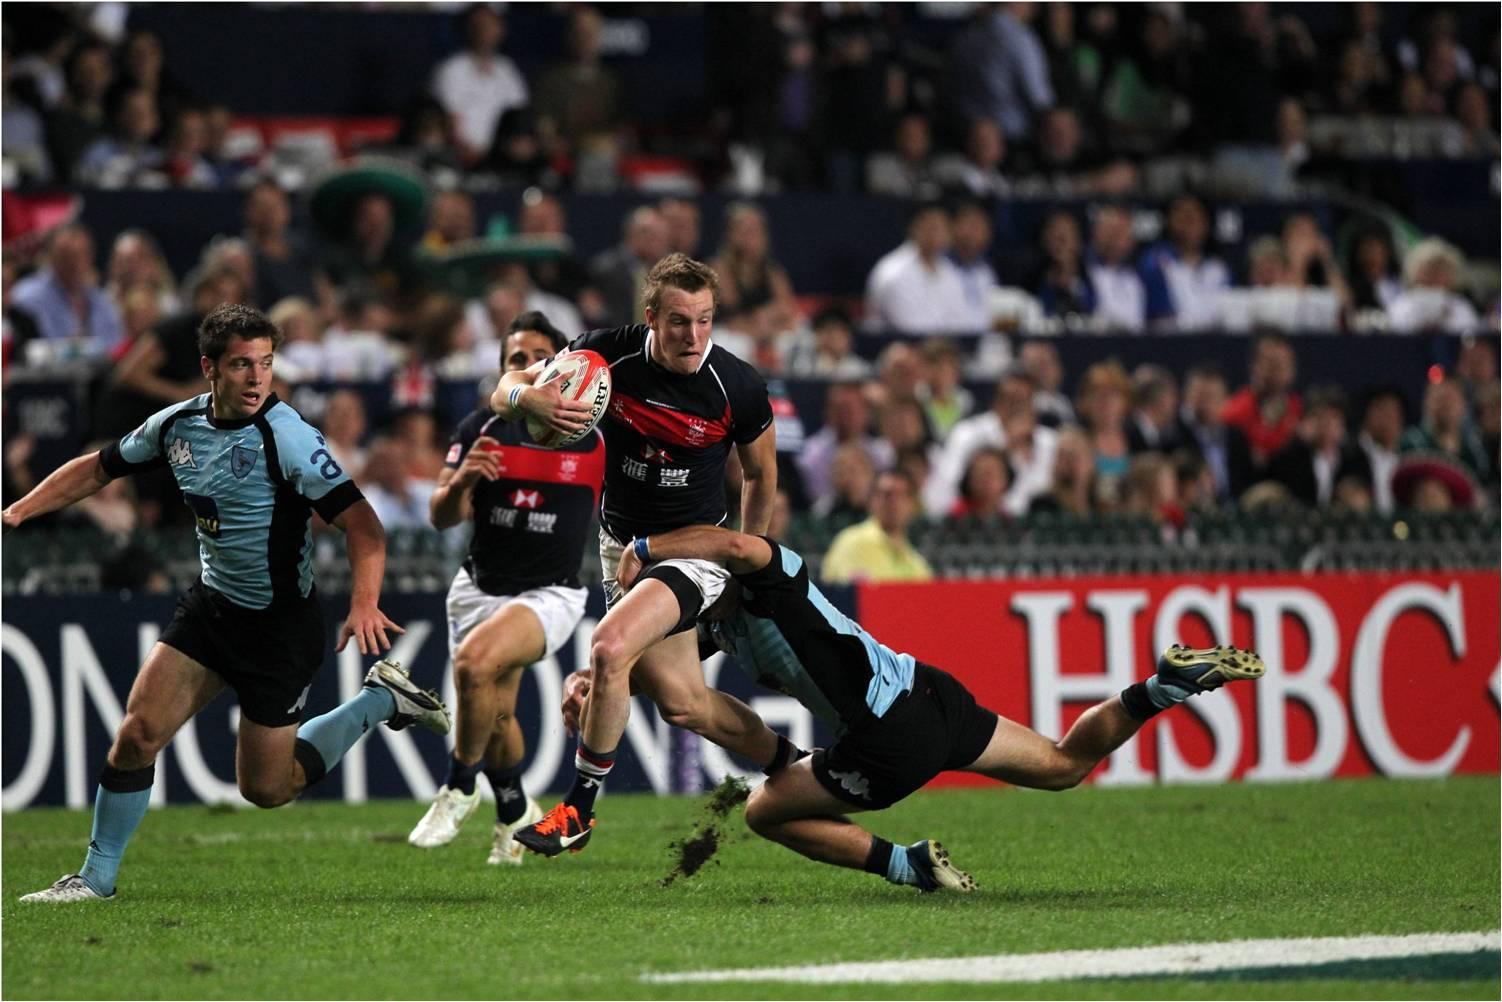 Glorious Fiji win Hong Kong Sevens as three book core status on 2012/13 Series